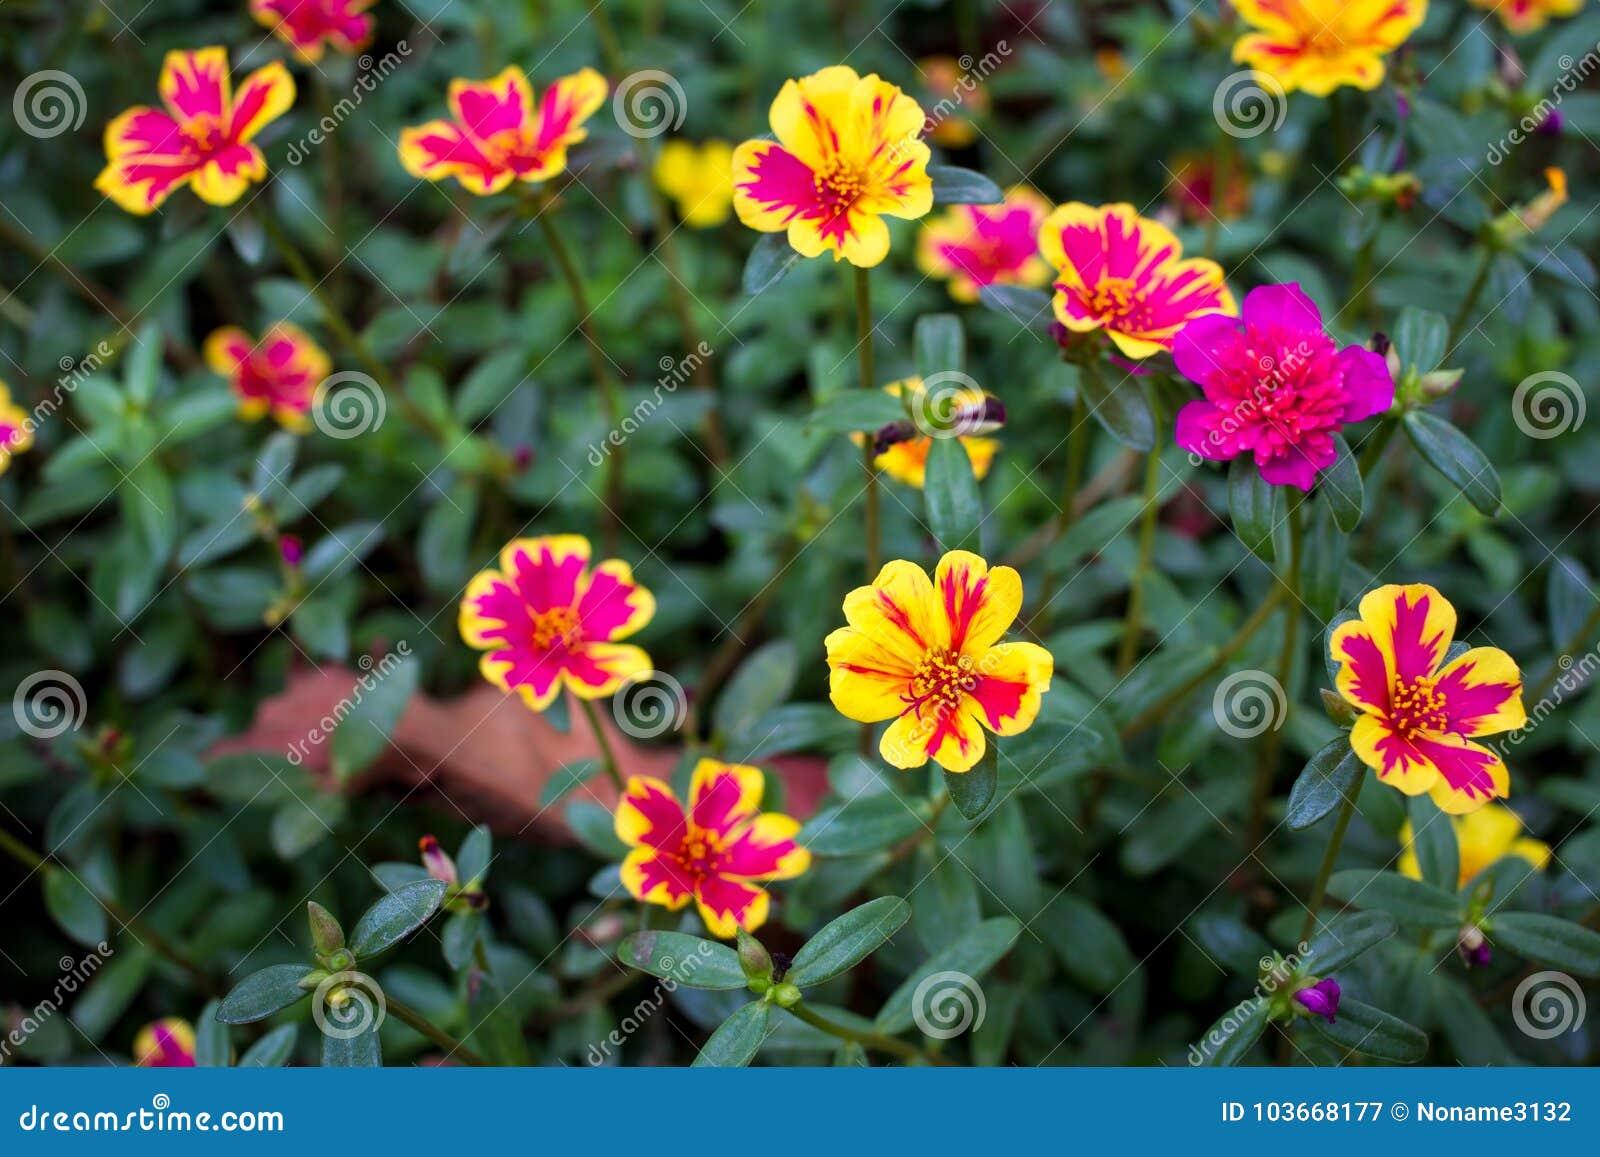 Unknown beautiful flower in garden stock image image of buttercup unknown beautiful flower in garden izmirmasajfo